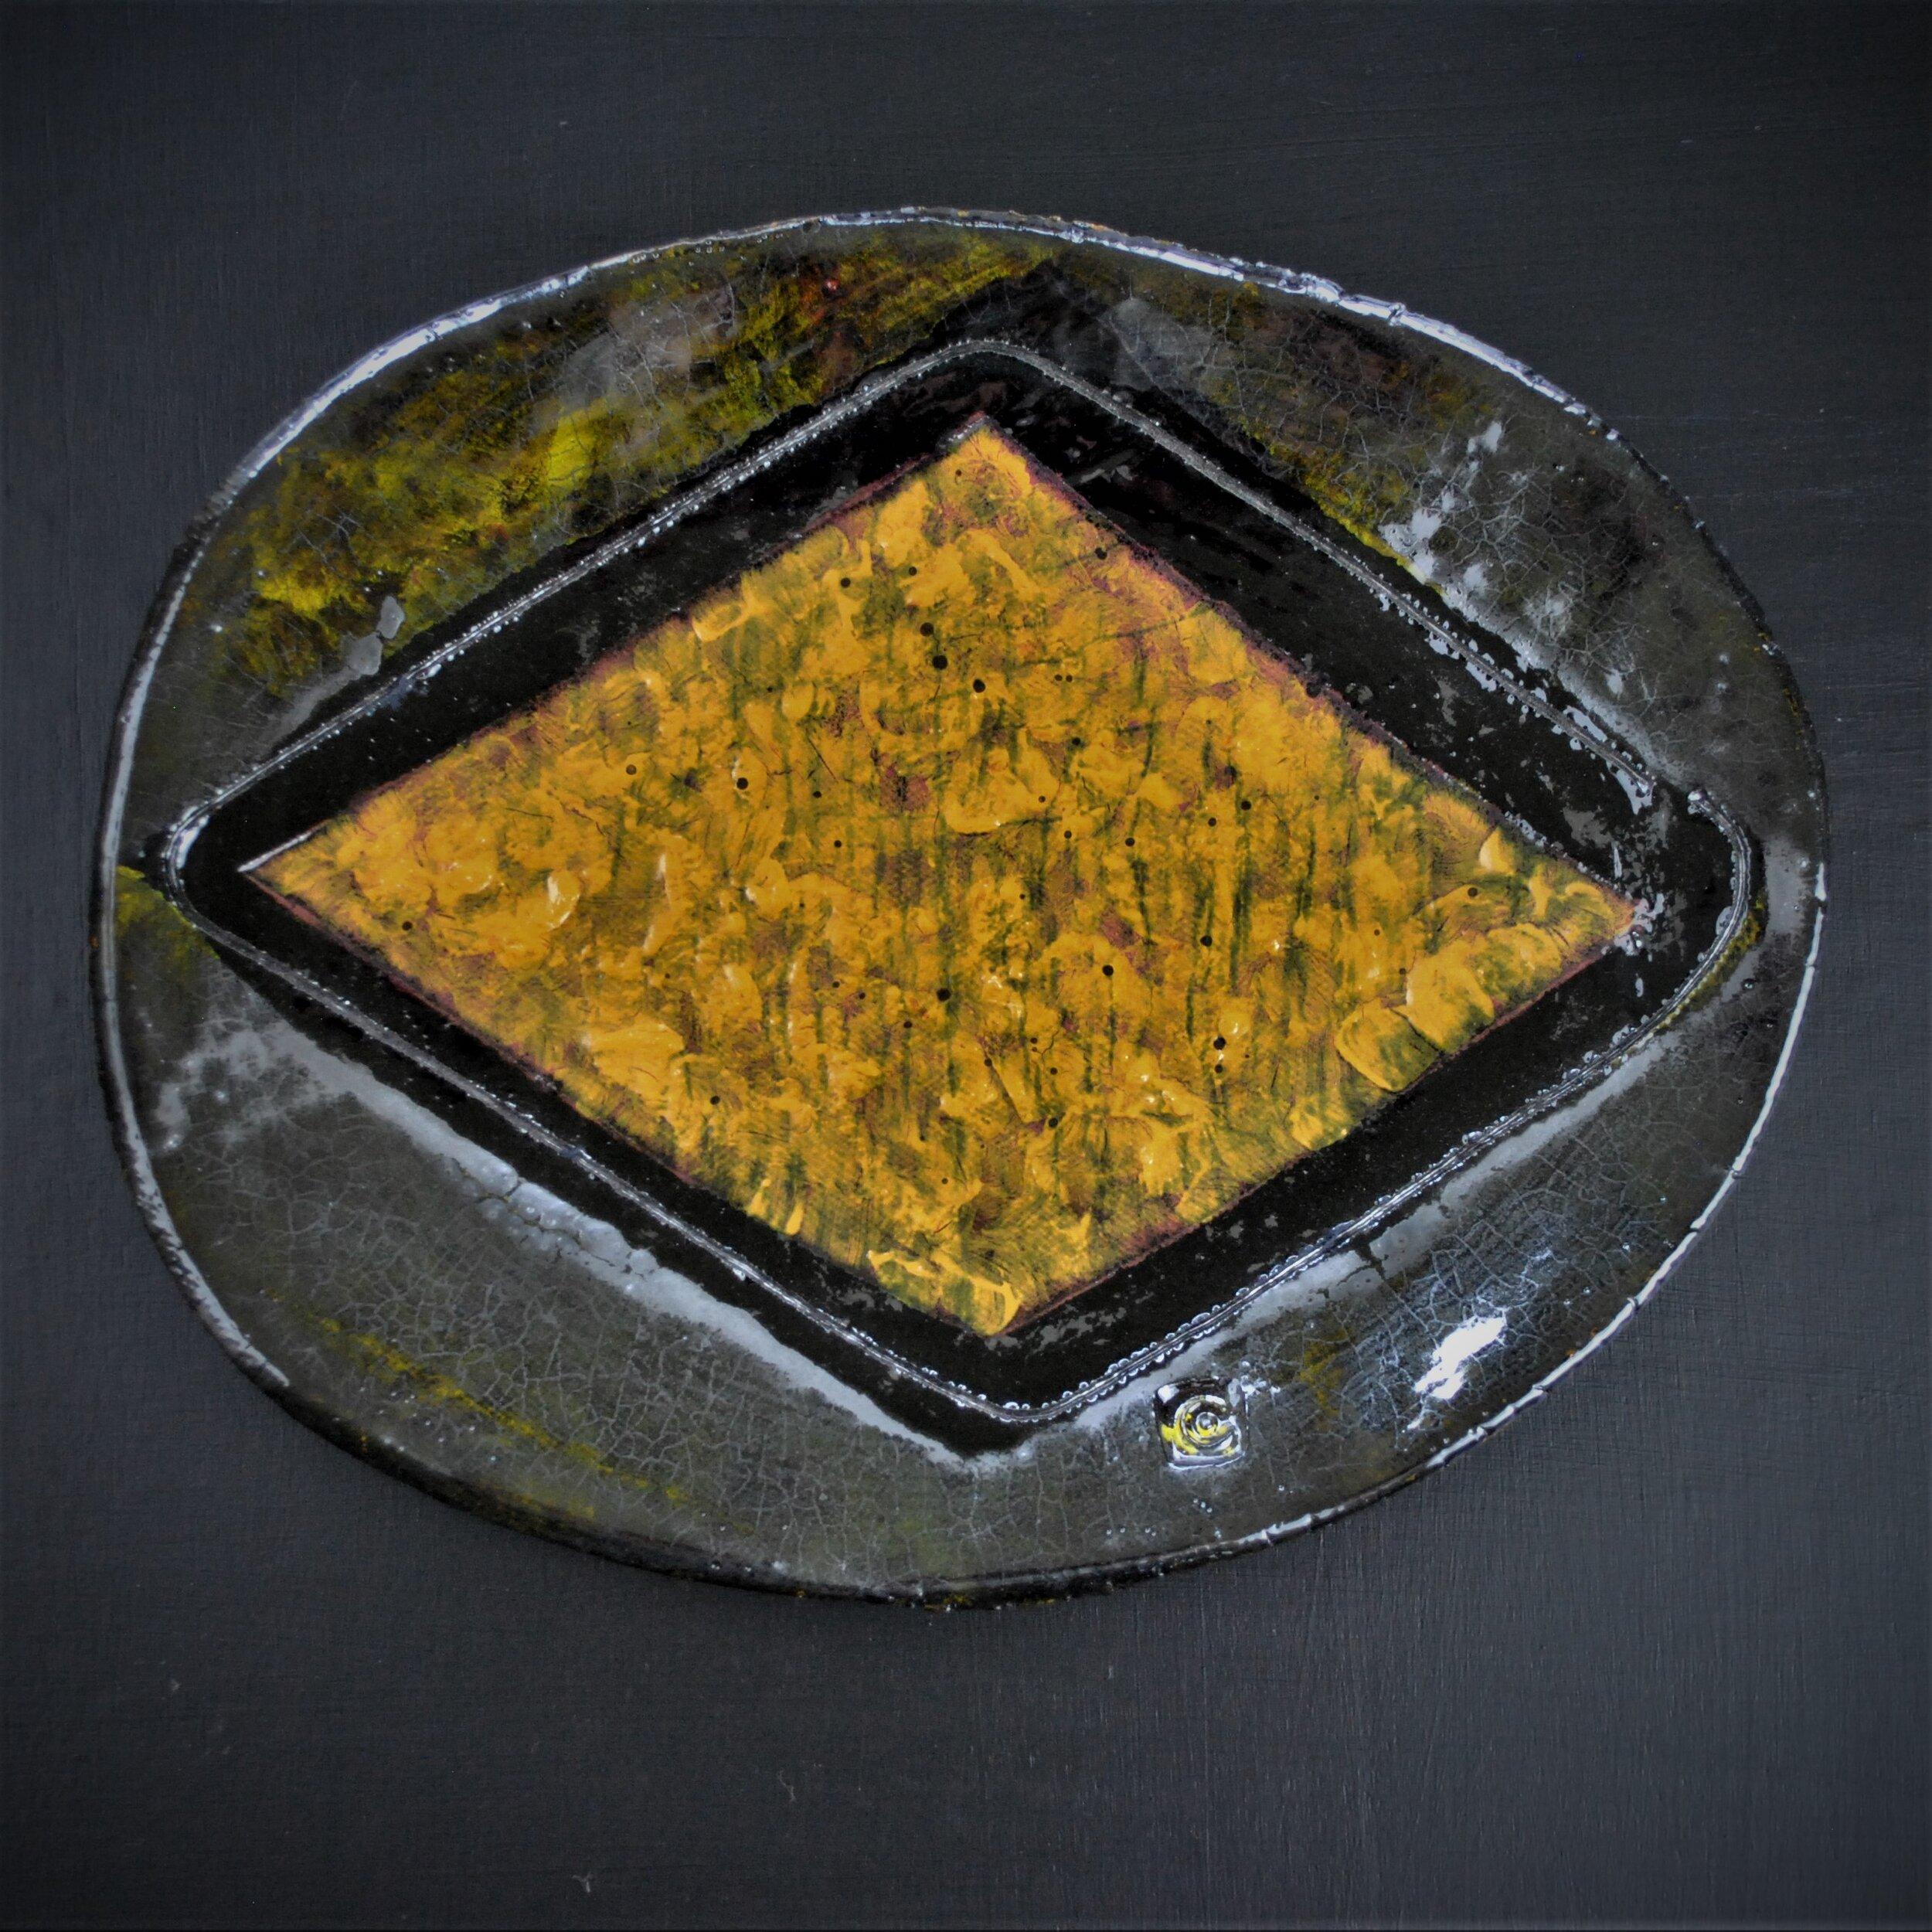 Mike Cain  2019 Large yellow diamond (Square edit) jDSC_6220 (2).JPG